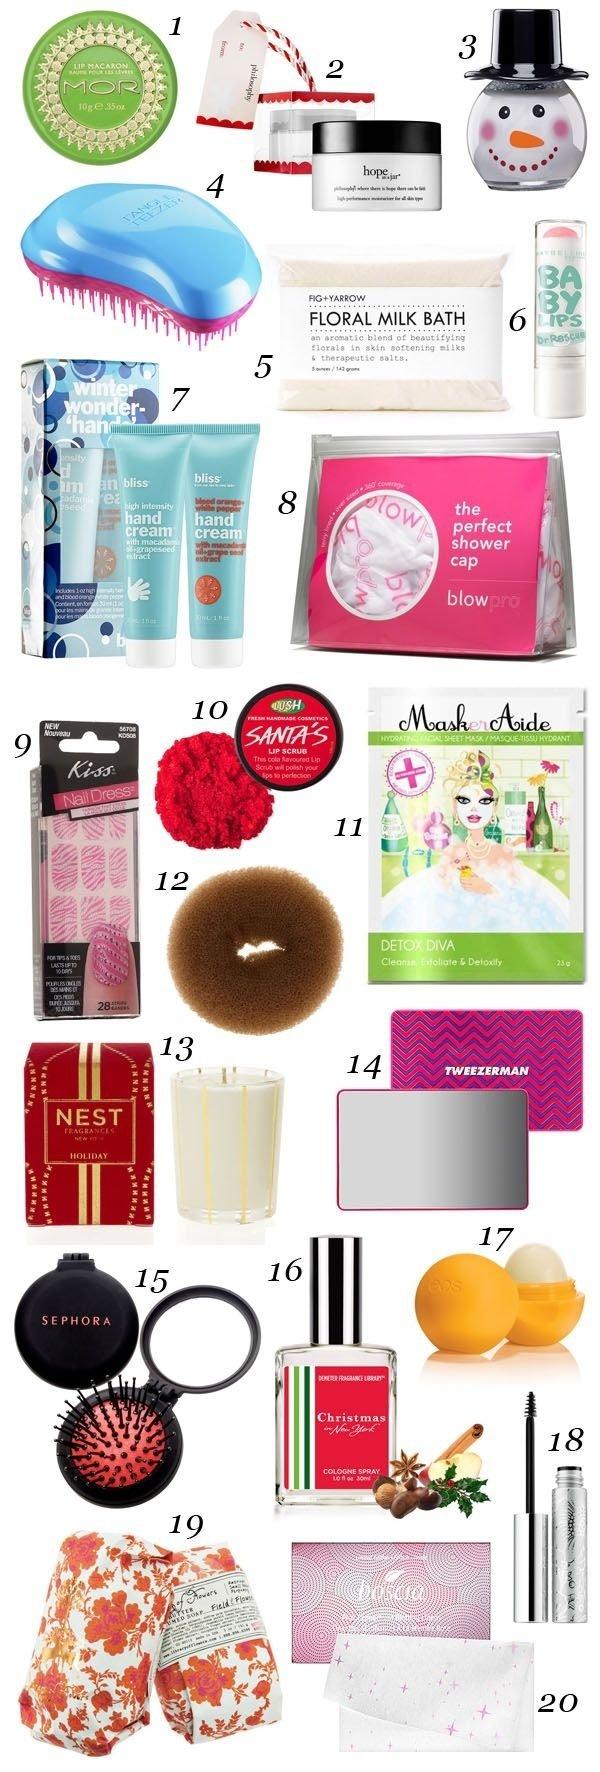 10 Wonderful Stocking Stuffer Ideas For Girlfriend 366 best stocking stuffers images on pinterest christmas 1